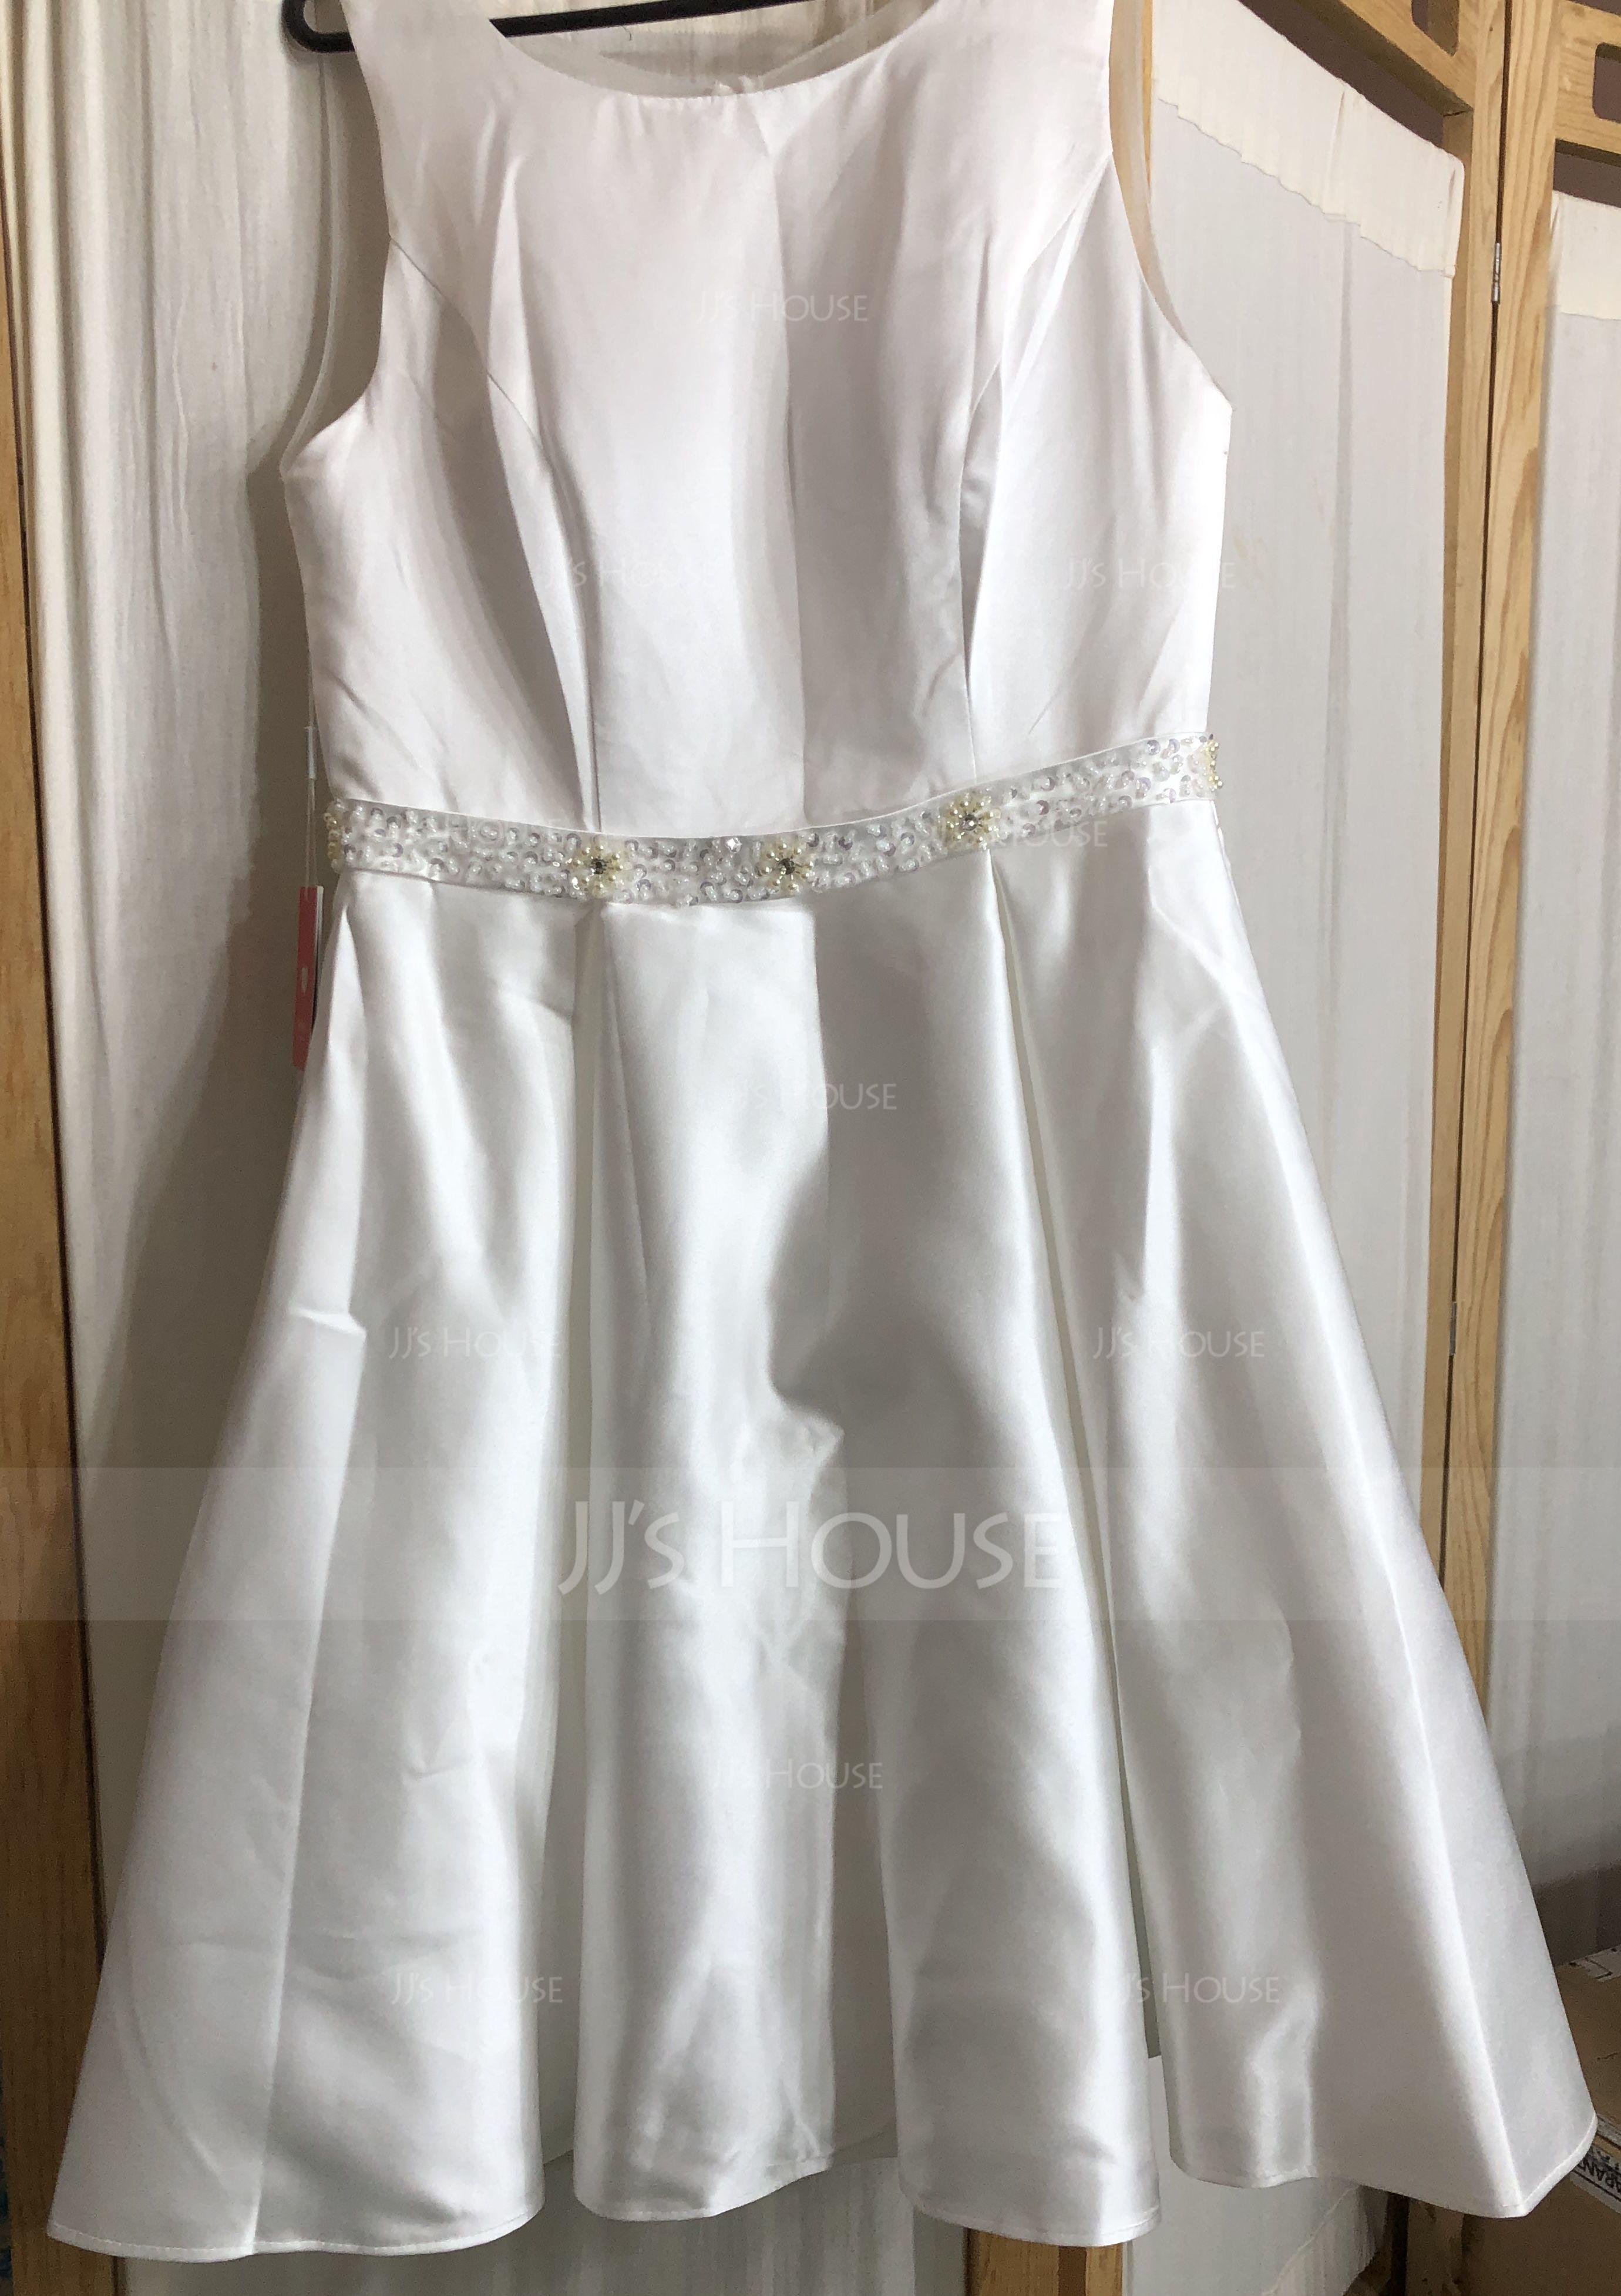 A-Line/Princess Scoop Neck Knee-Length Satin Wedding Dress With Beading Sequins (002052770)